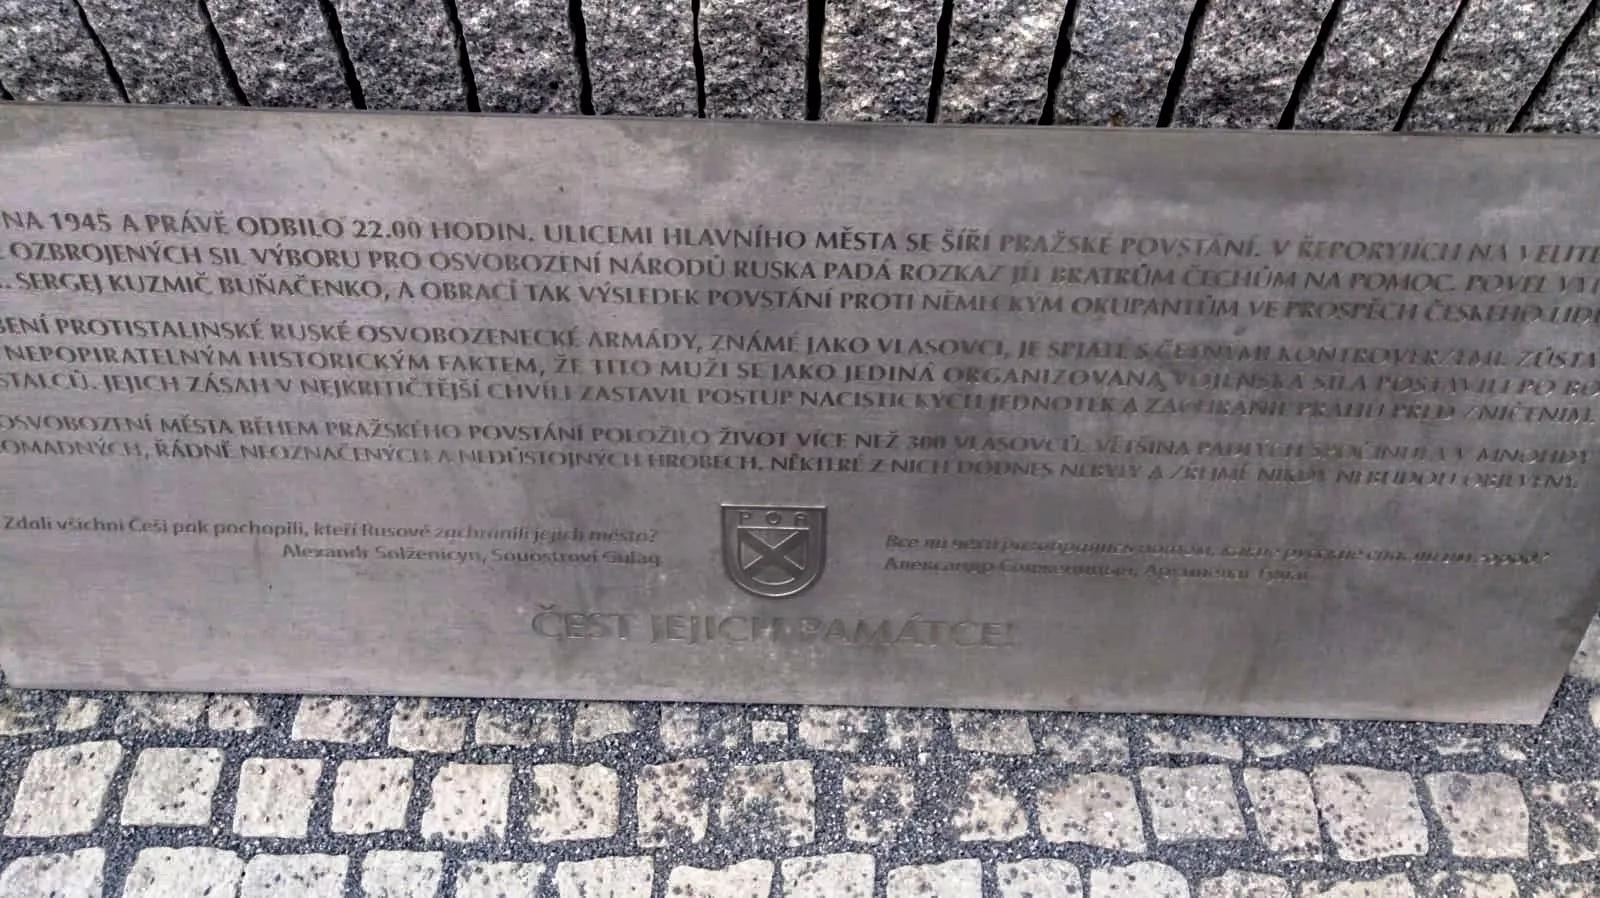 20200430-В Праге установлена памятная доска «власовцам»-pic04